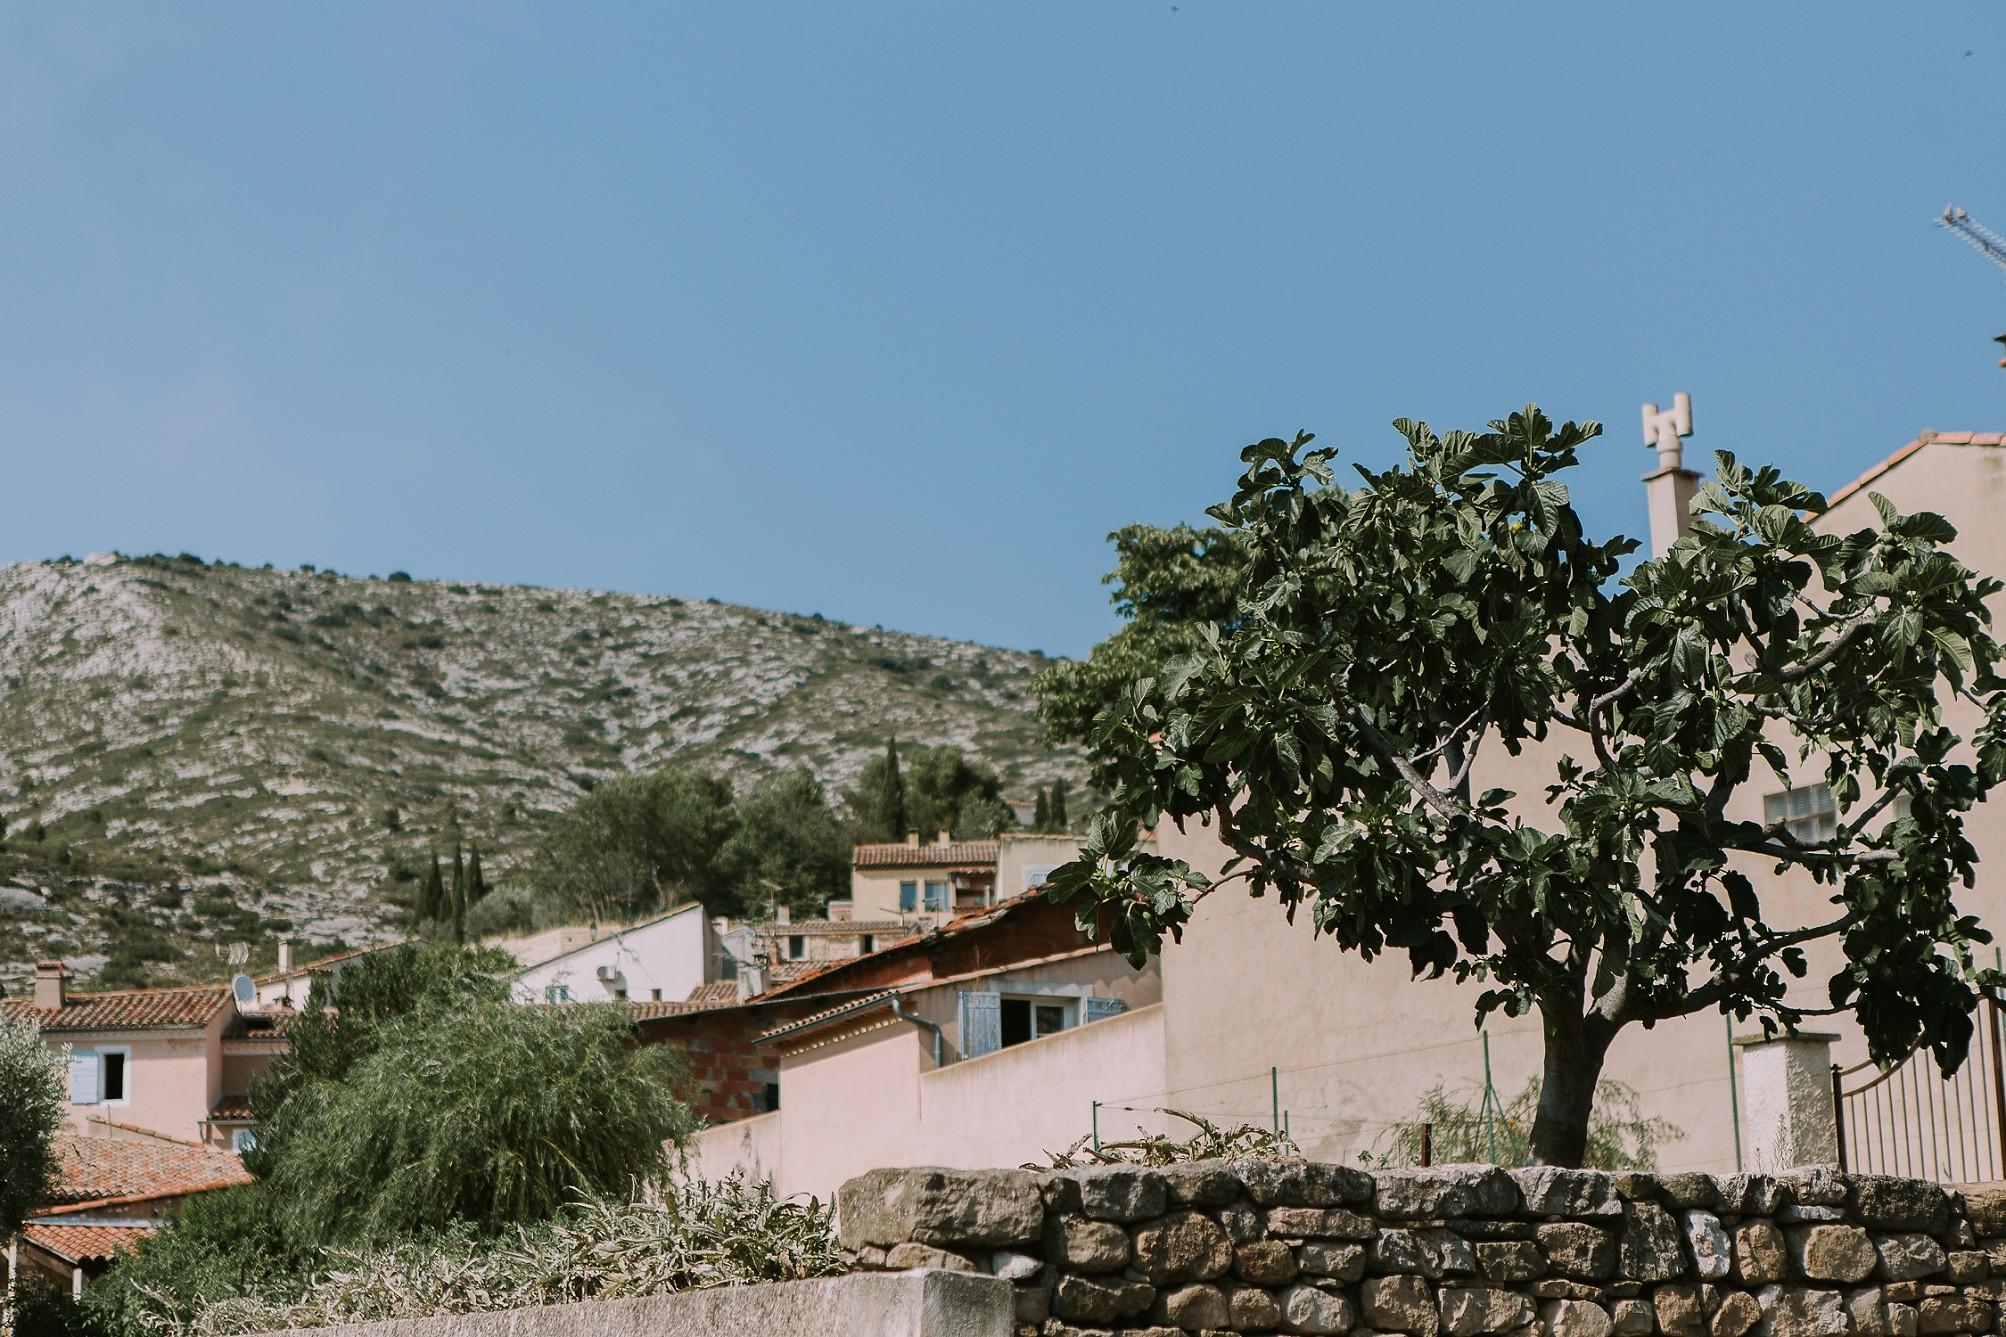 katerynaphotos-mariage-photographe-puyloubier-provence-aix-en-provence-sud-de-la-france_0371.jpg